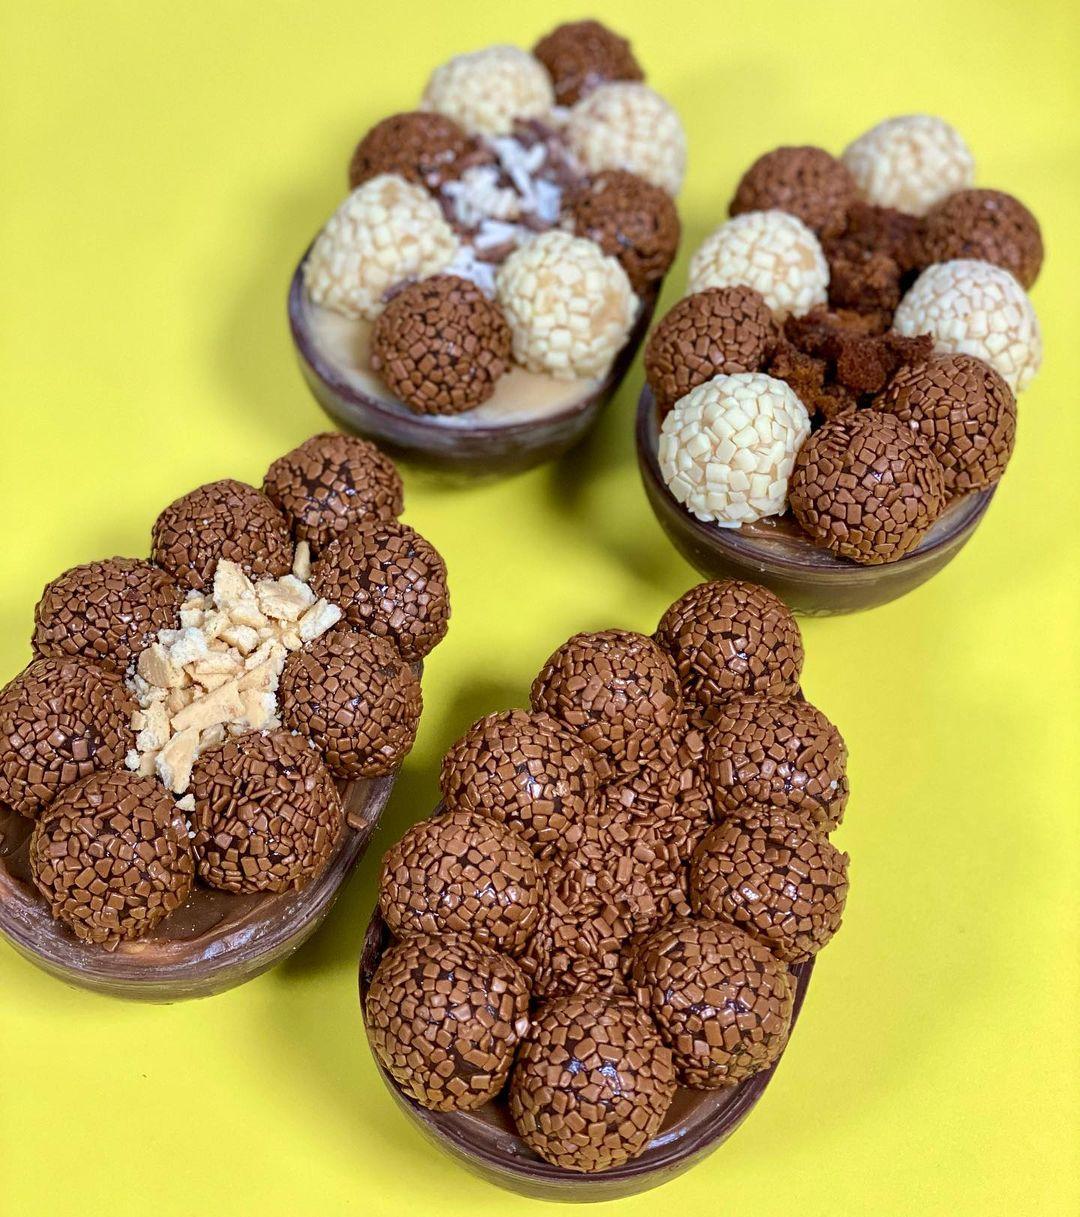 Roteiro de ovos de Páscoa artesanais para encomendar de pequenos empreendedores